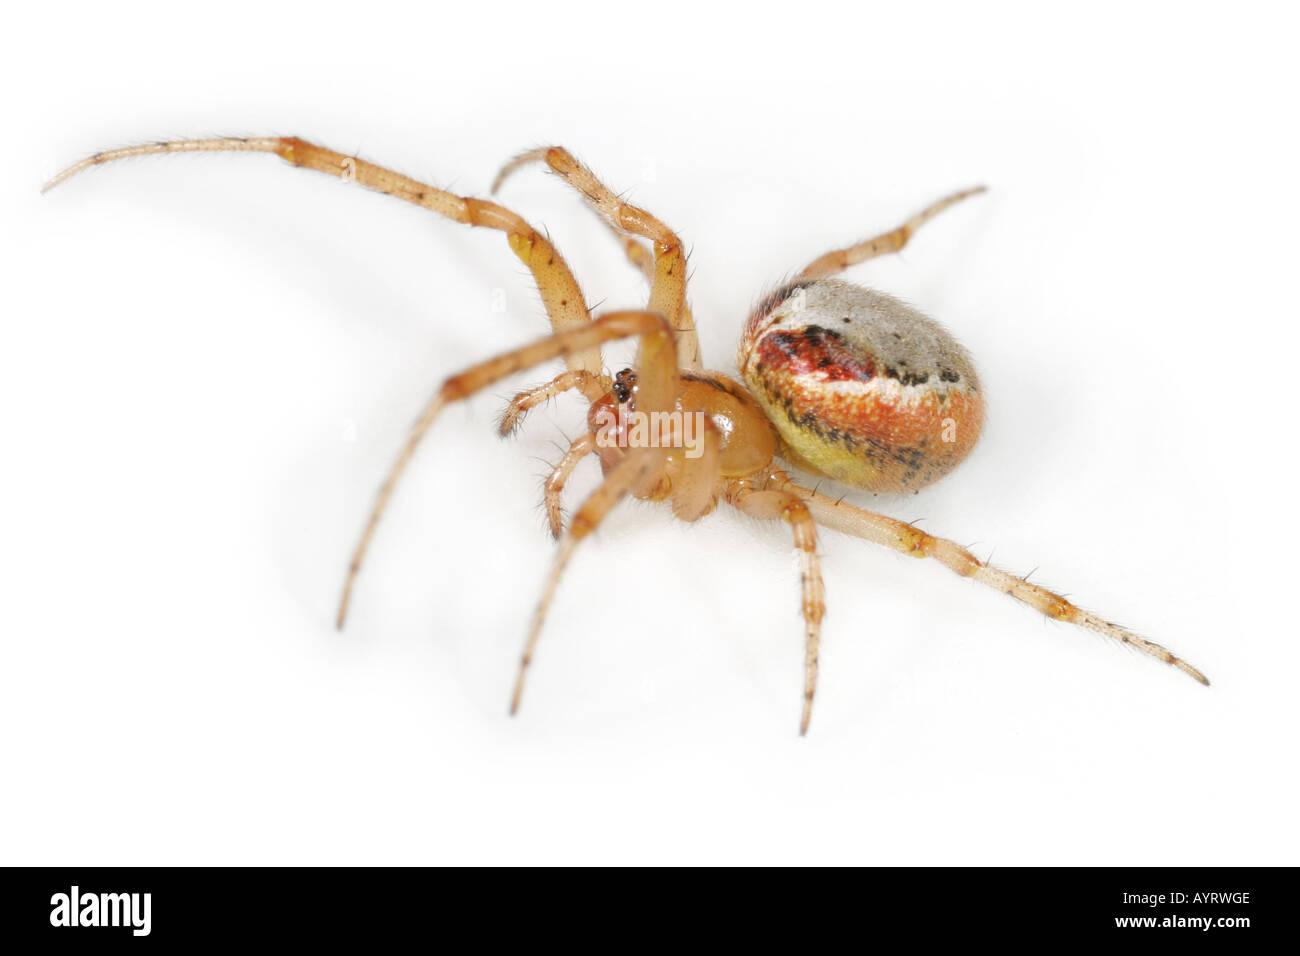 Zygiella Atrica spider on white background Stock Photo